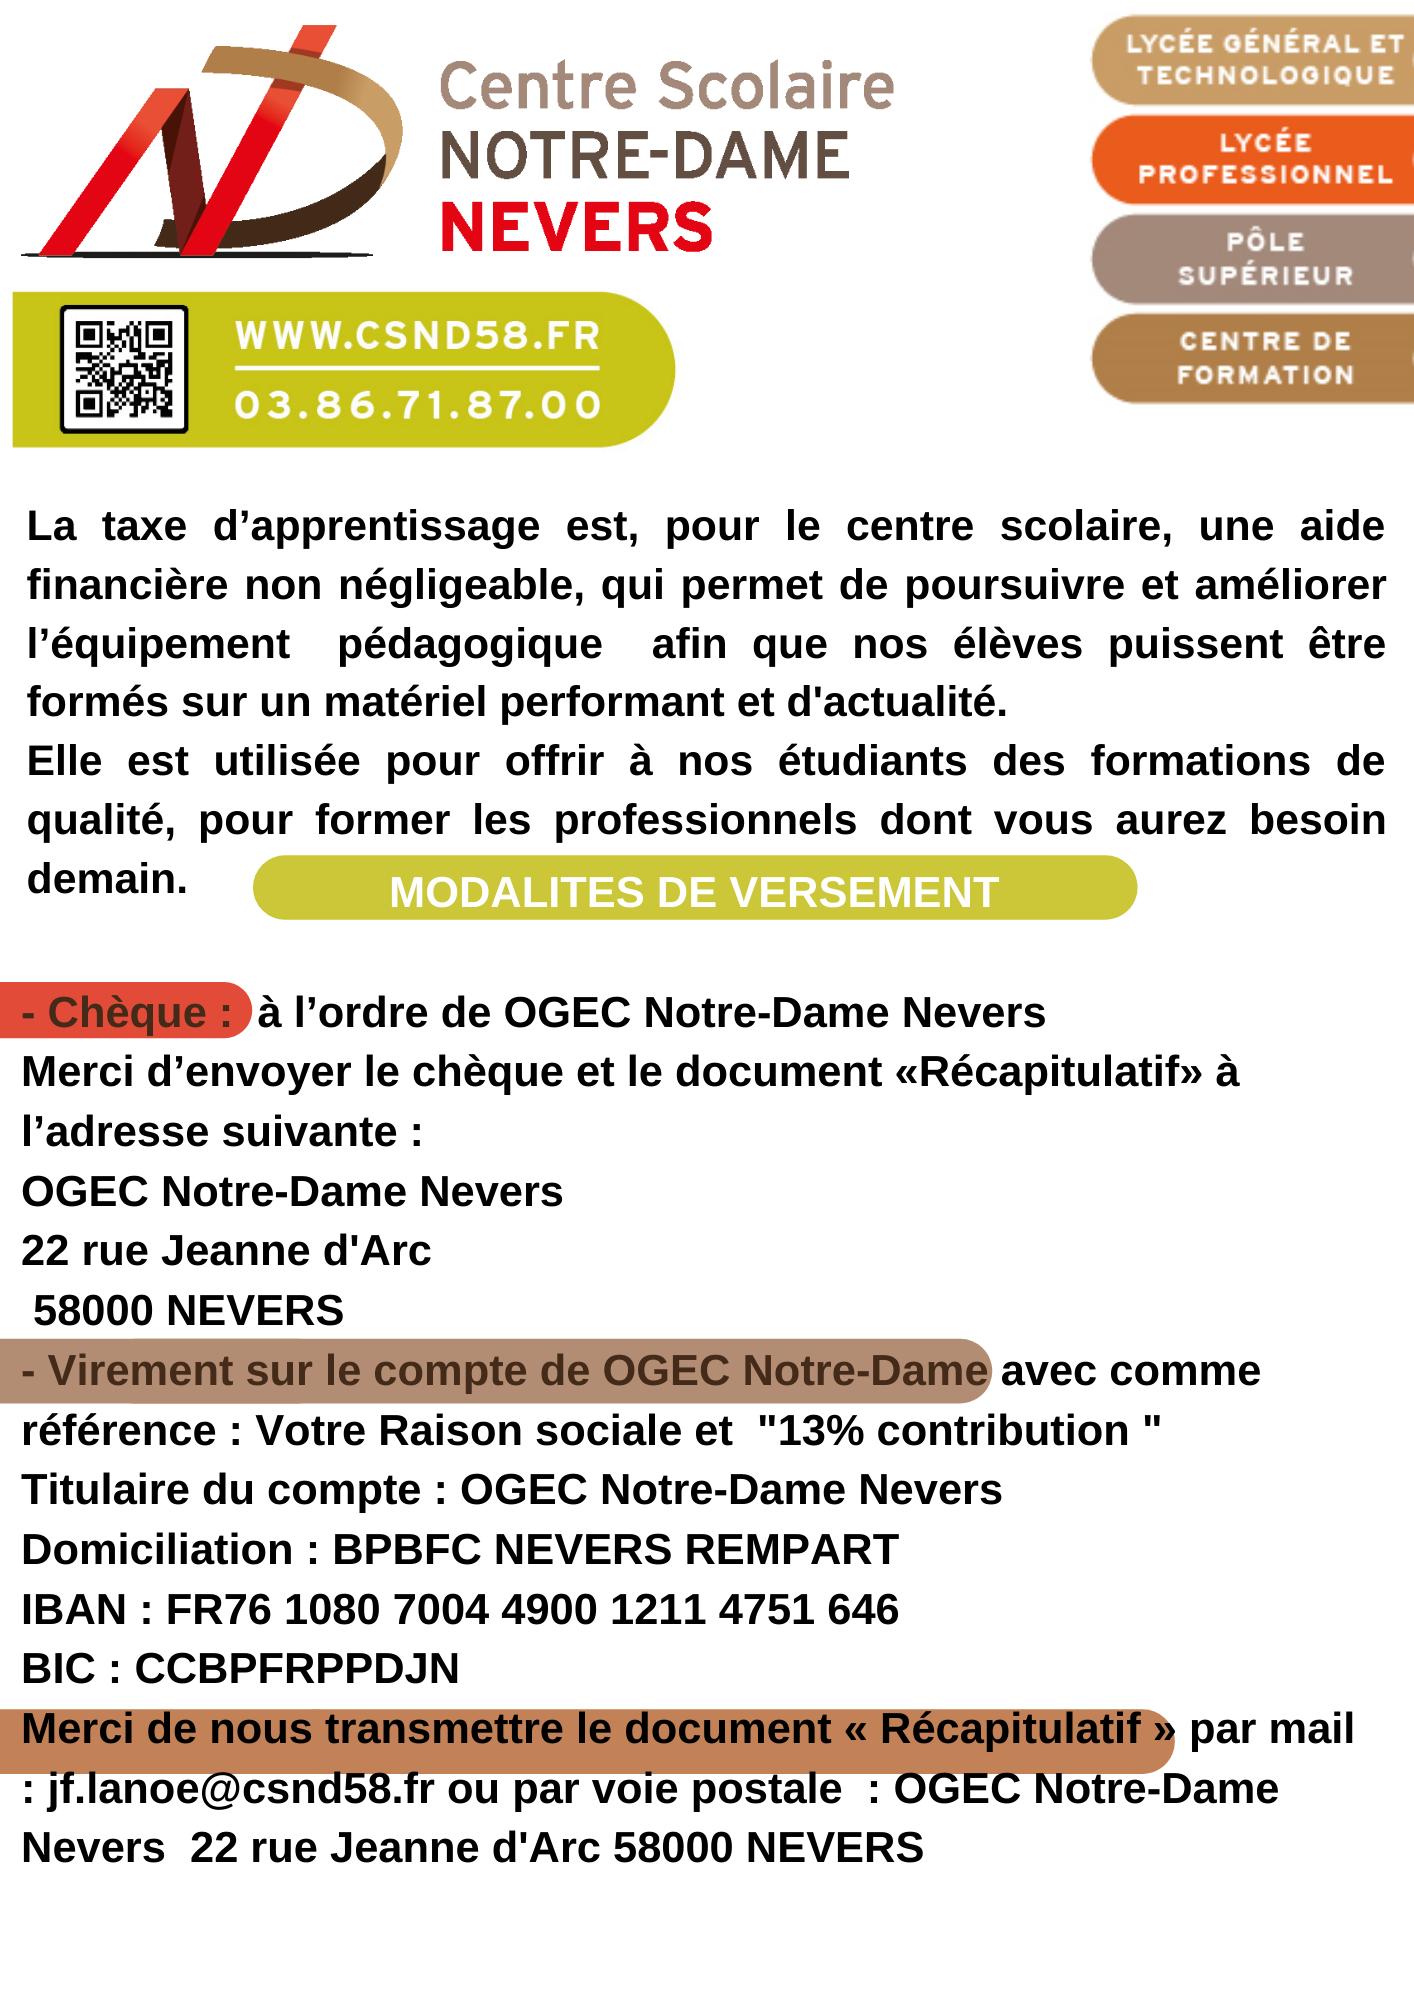 Centre scolaire Notre-Dame 22 rue jeanne d'Arc 58000 NEVERS 03 86 71 87 12 www.csnd58_fr contact@csnd58.fr (4)